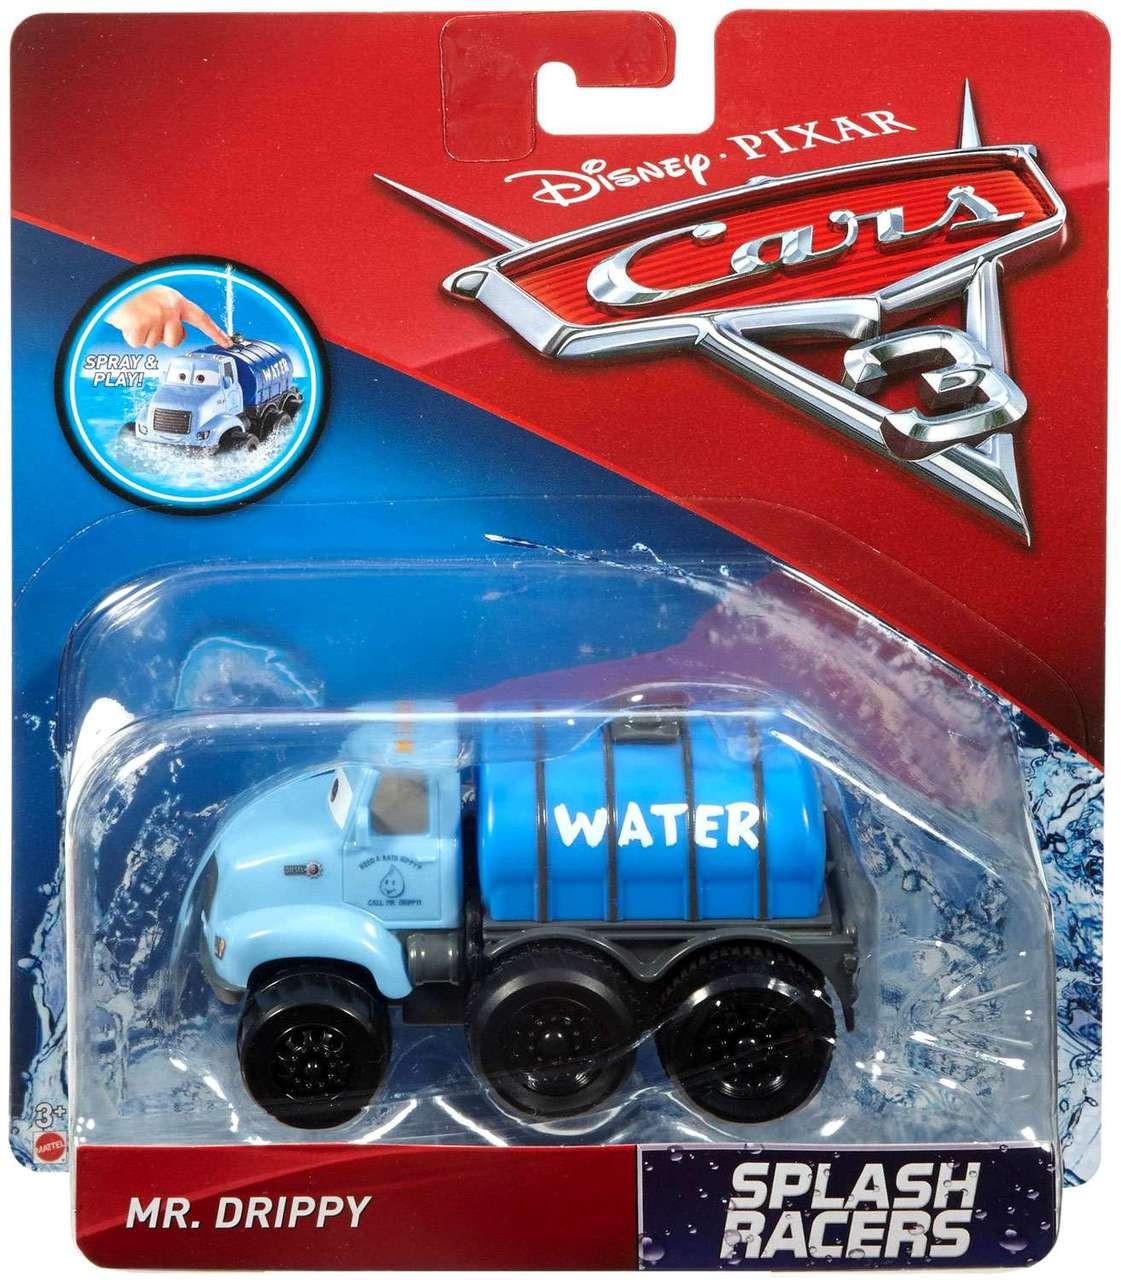 Disney Pixar Cars Cars 3 Splash Racers Oversized Mr Drippy Bath